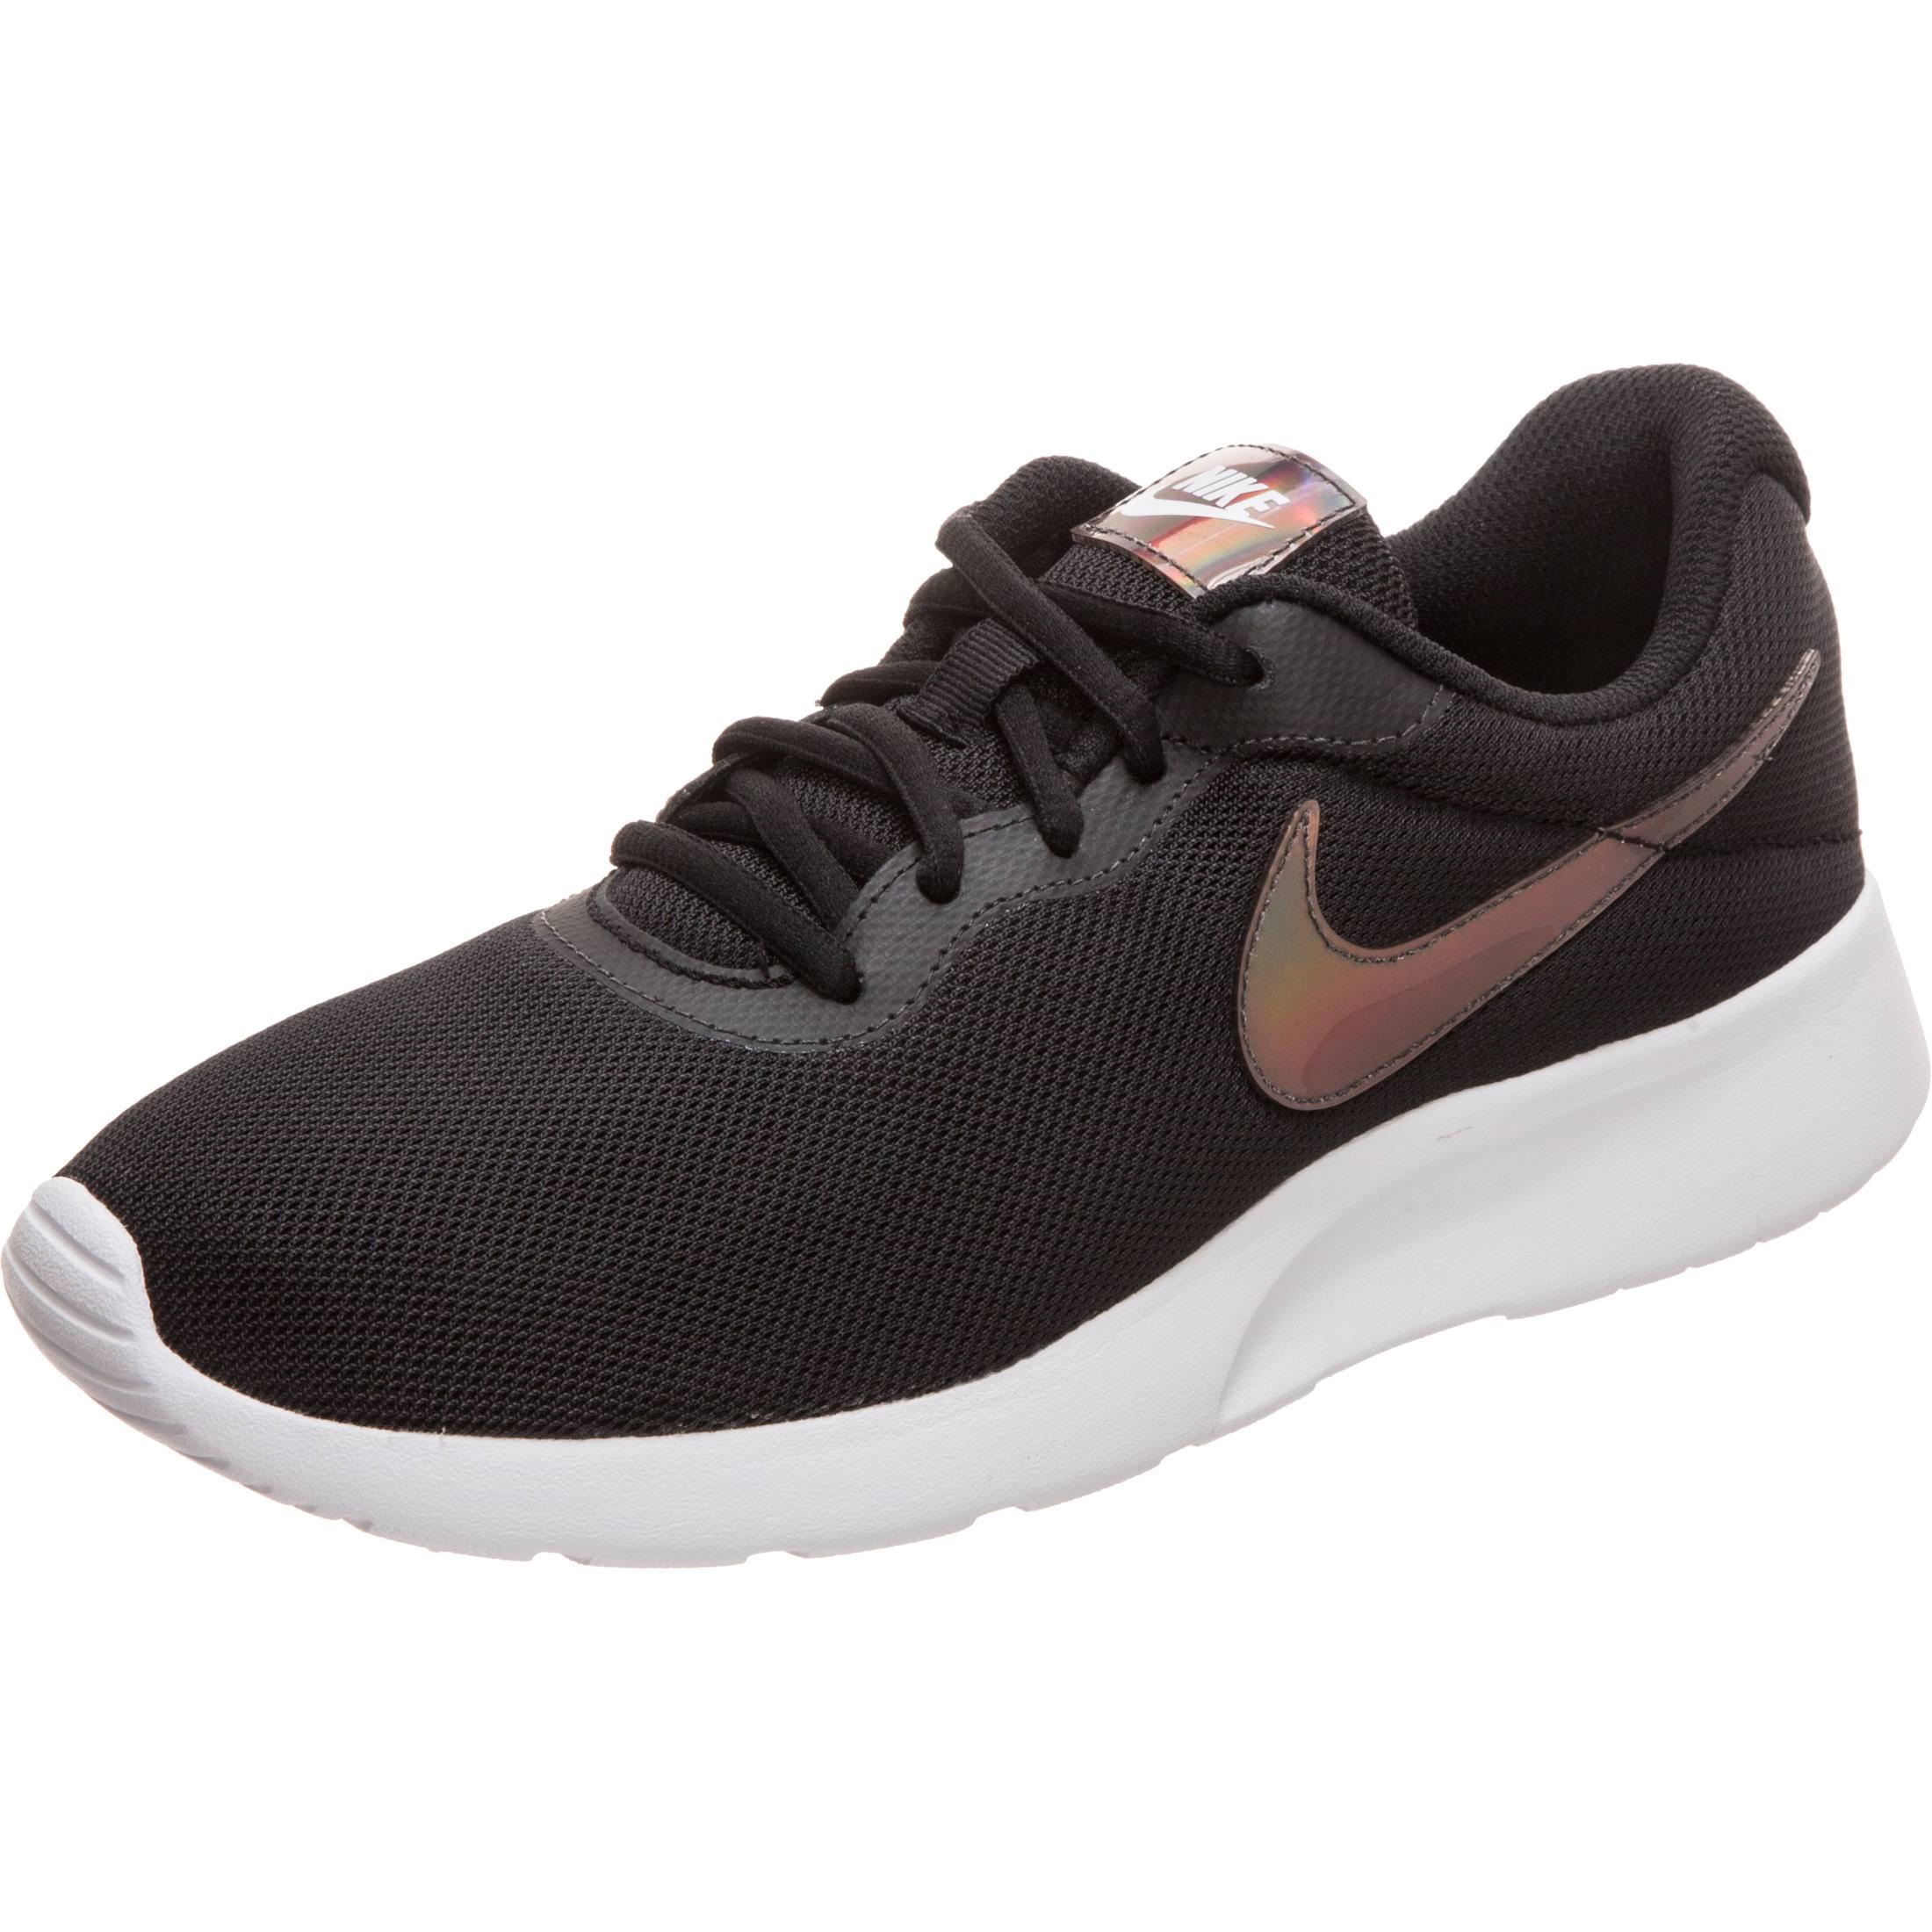 Da TanjunScarpe MarroneNero Nike Ginnastica Donna 29IWDEH